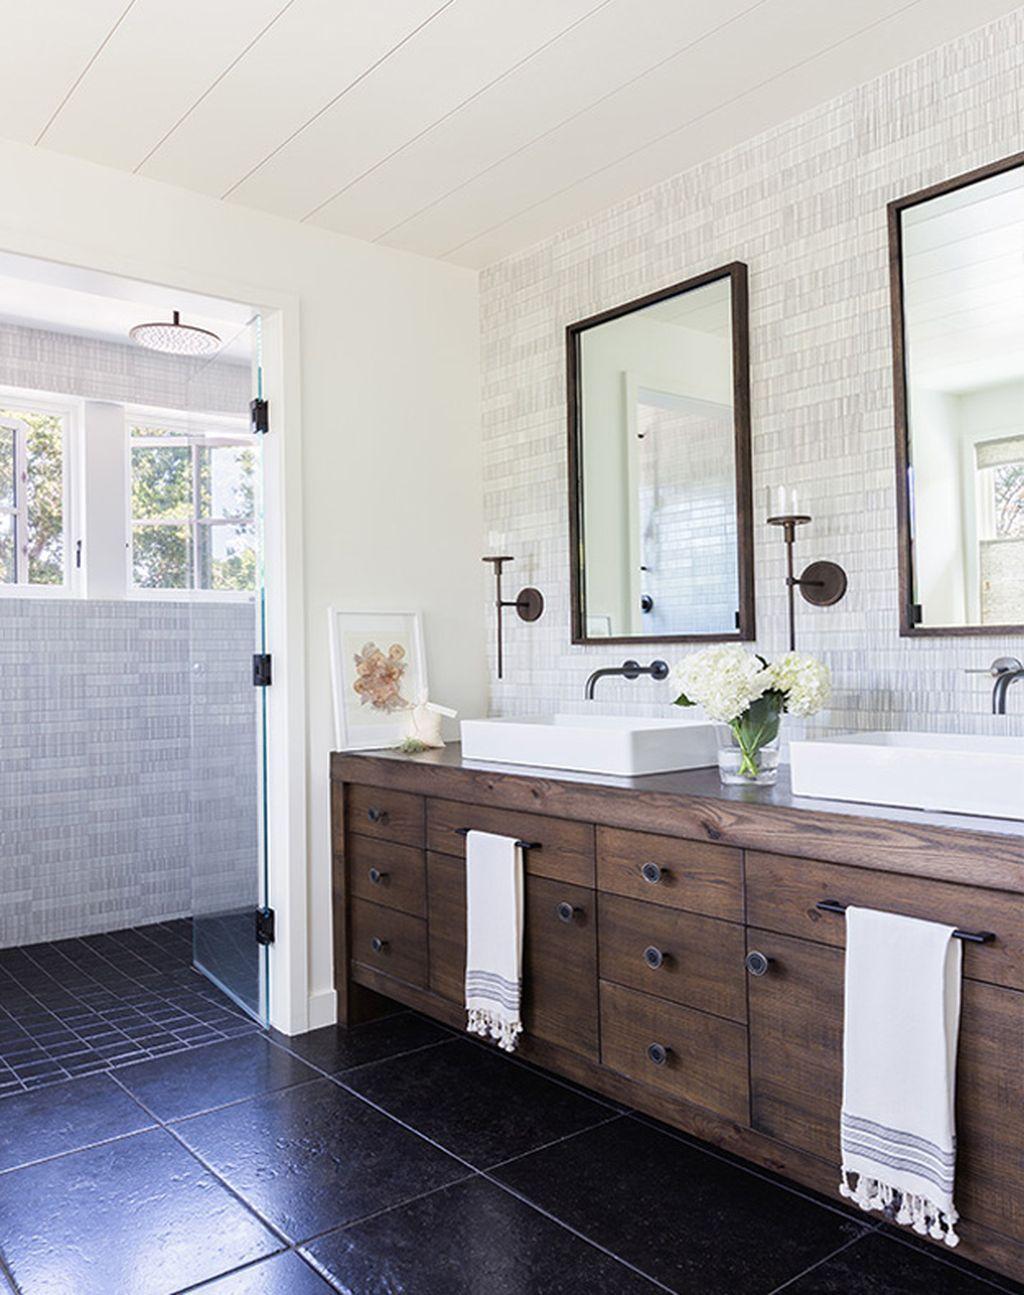 Modern Rustic Farmhouse Style Master Bathroom Ideas 49 Modern Farmhouse Bathroom Farmhouse Master Bathroom Bathroom Vanity Remodel